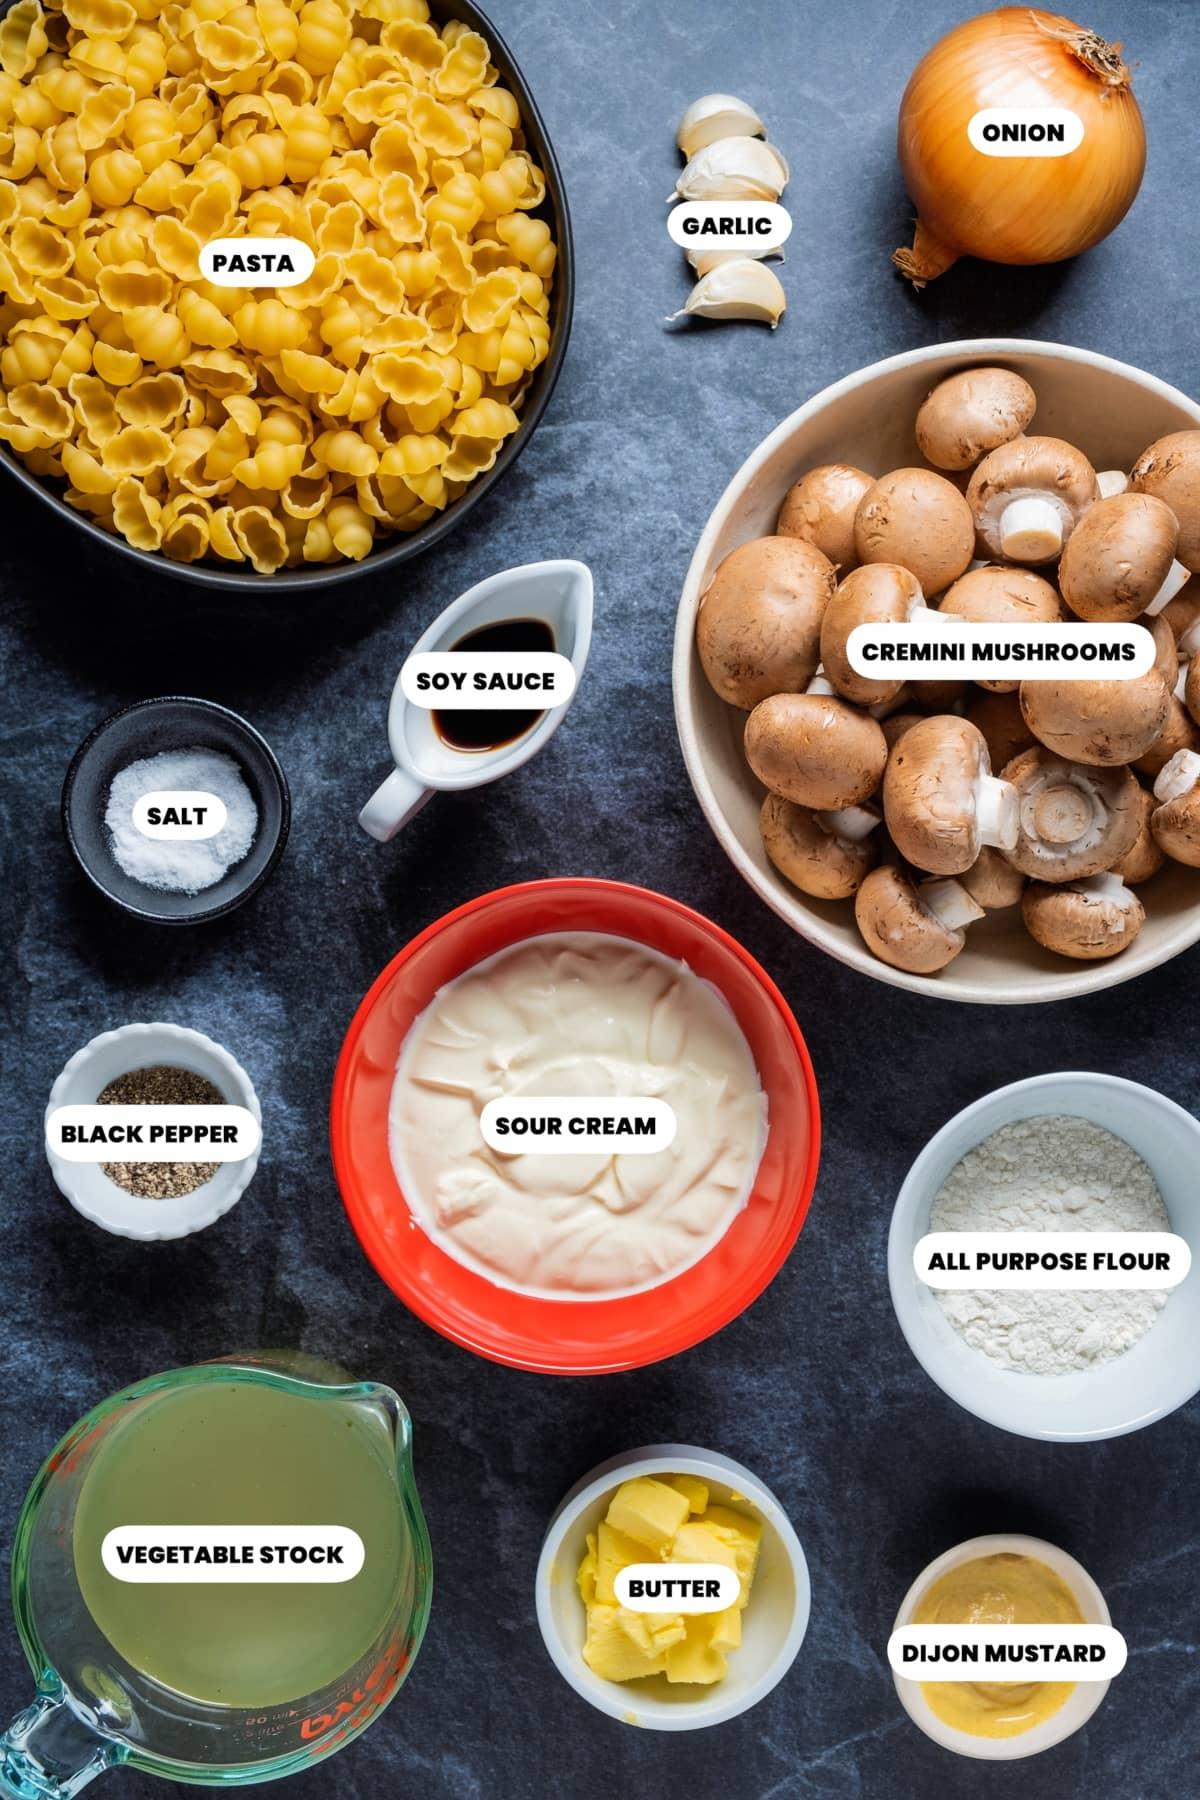 Photo of the ingredients needed to make vegetarian stroganoff.